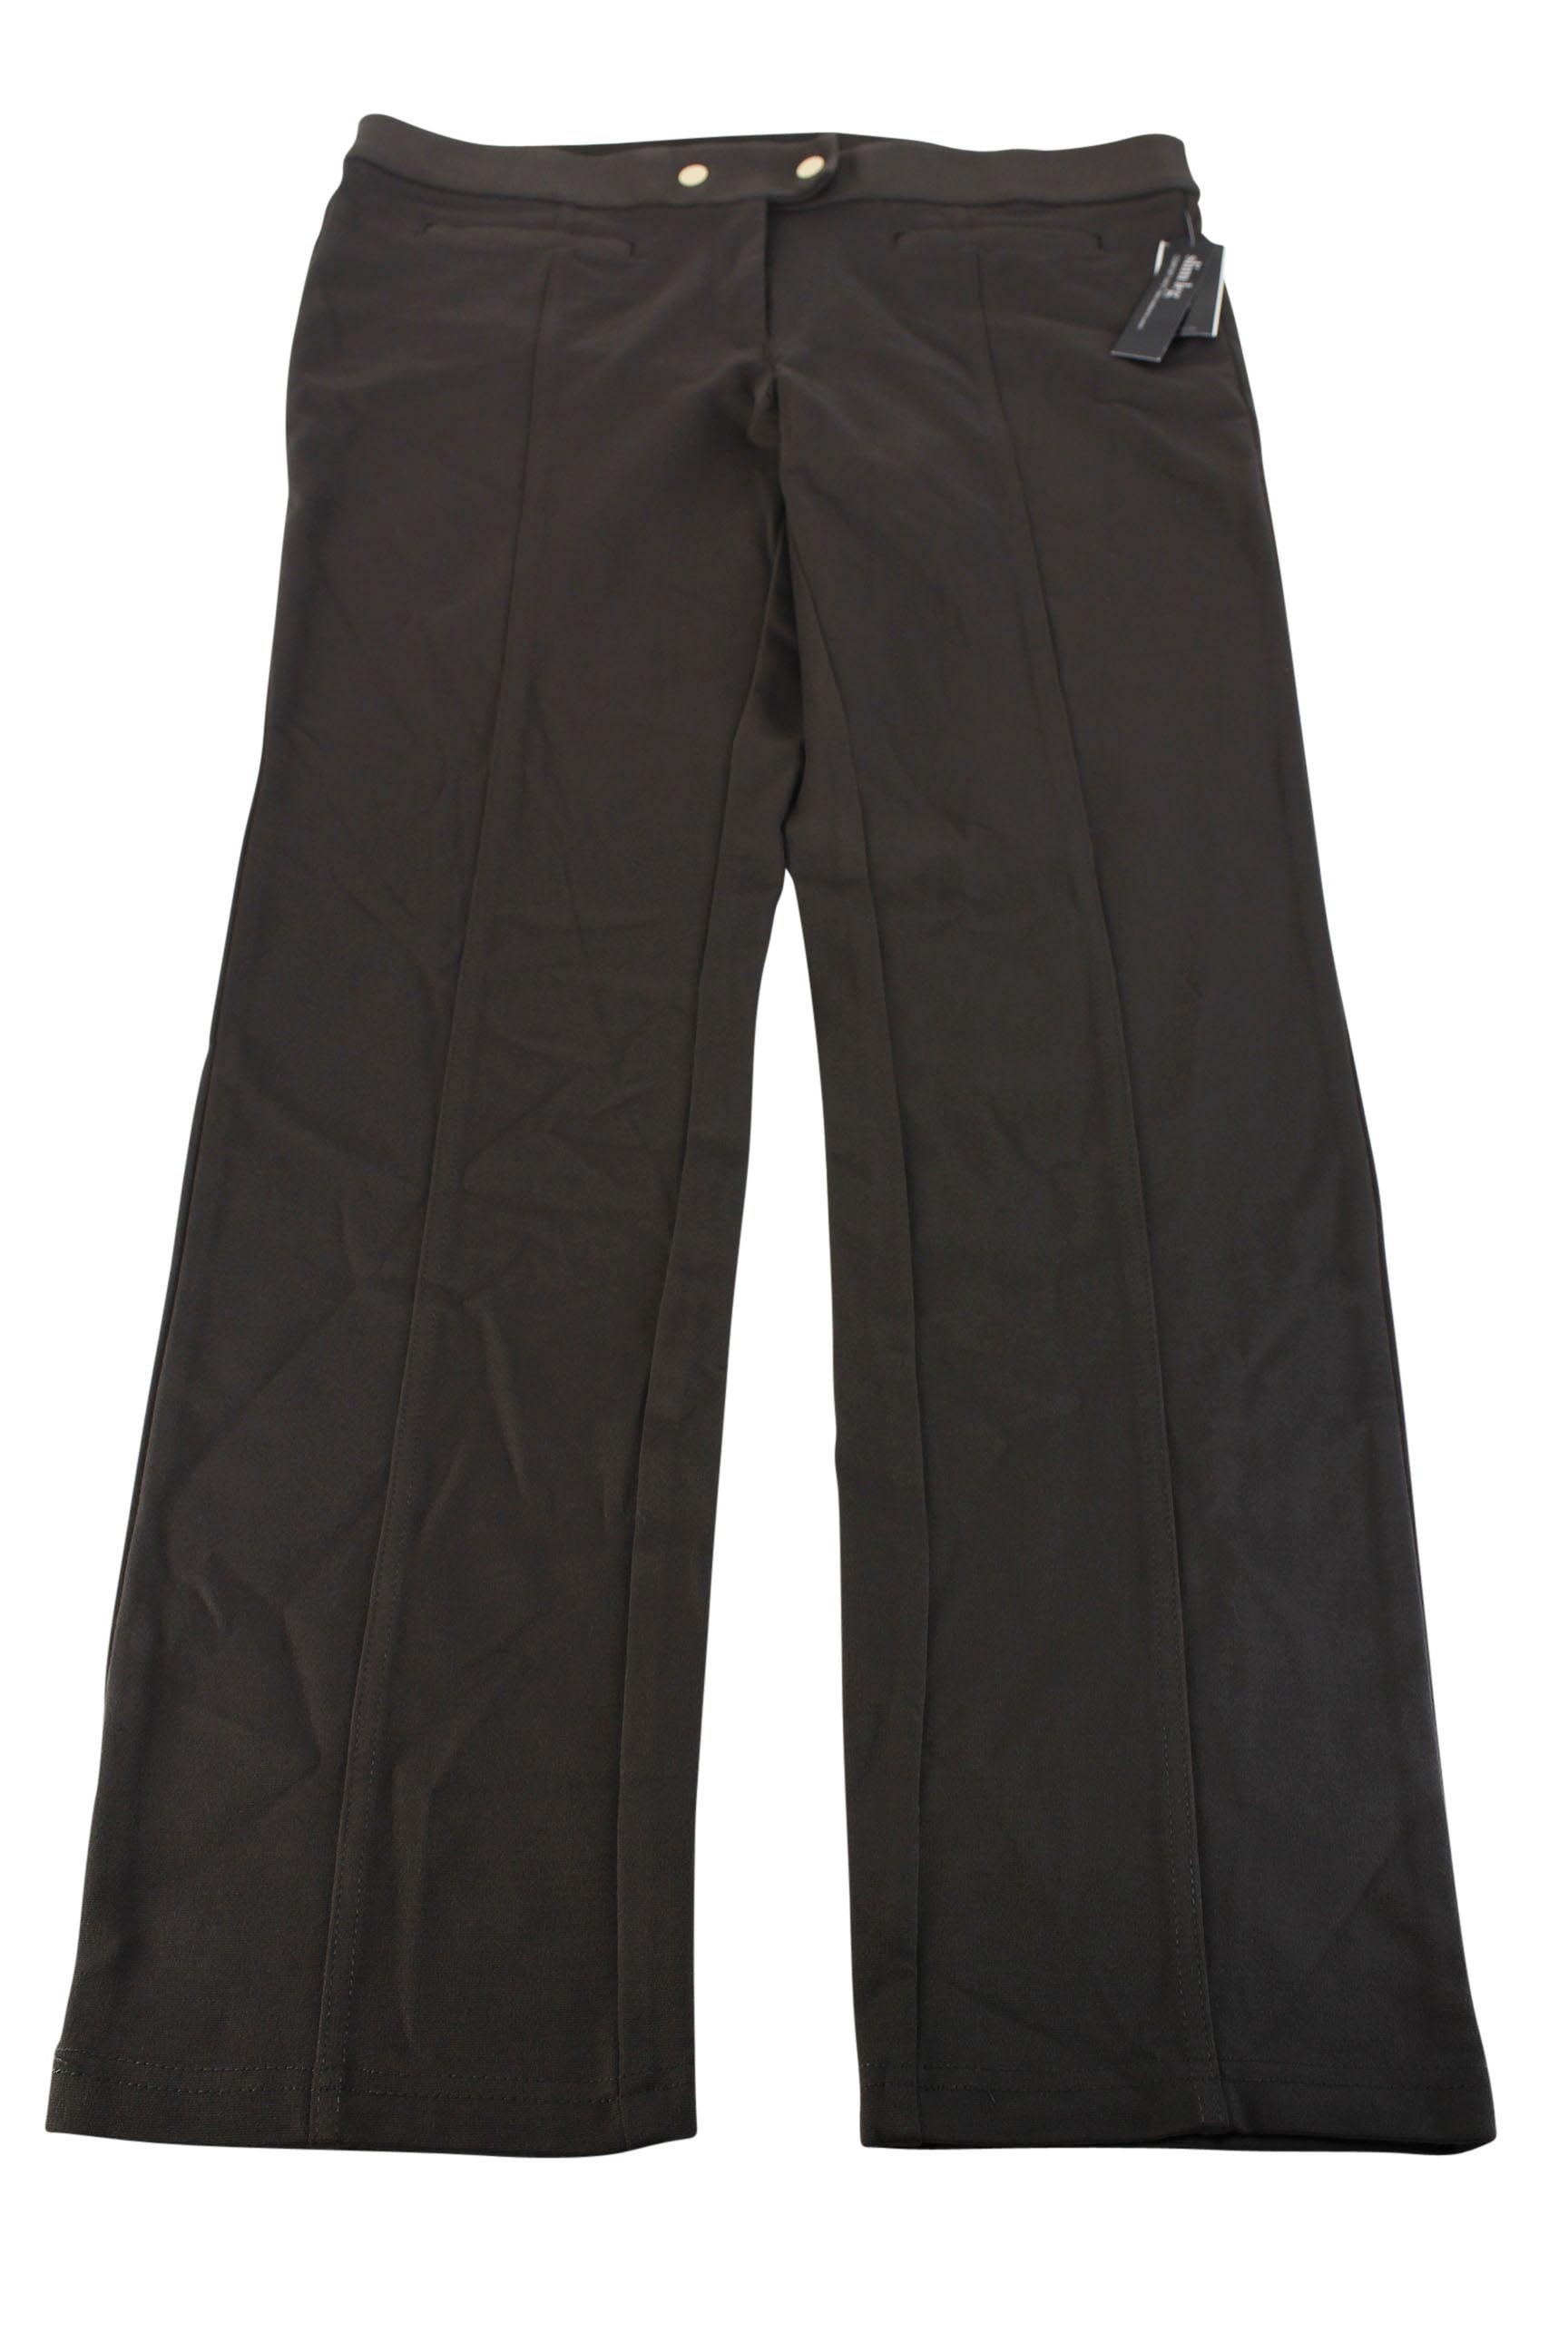 Alfani Womens Slim Fit Pants - Brown Rayon